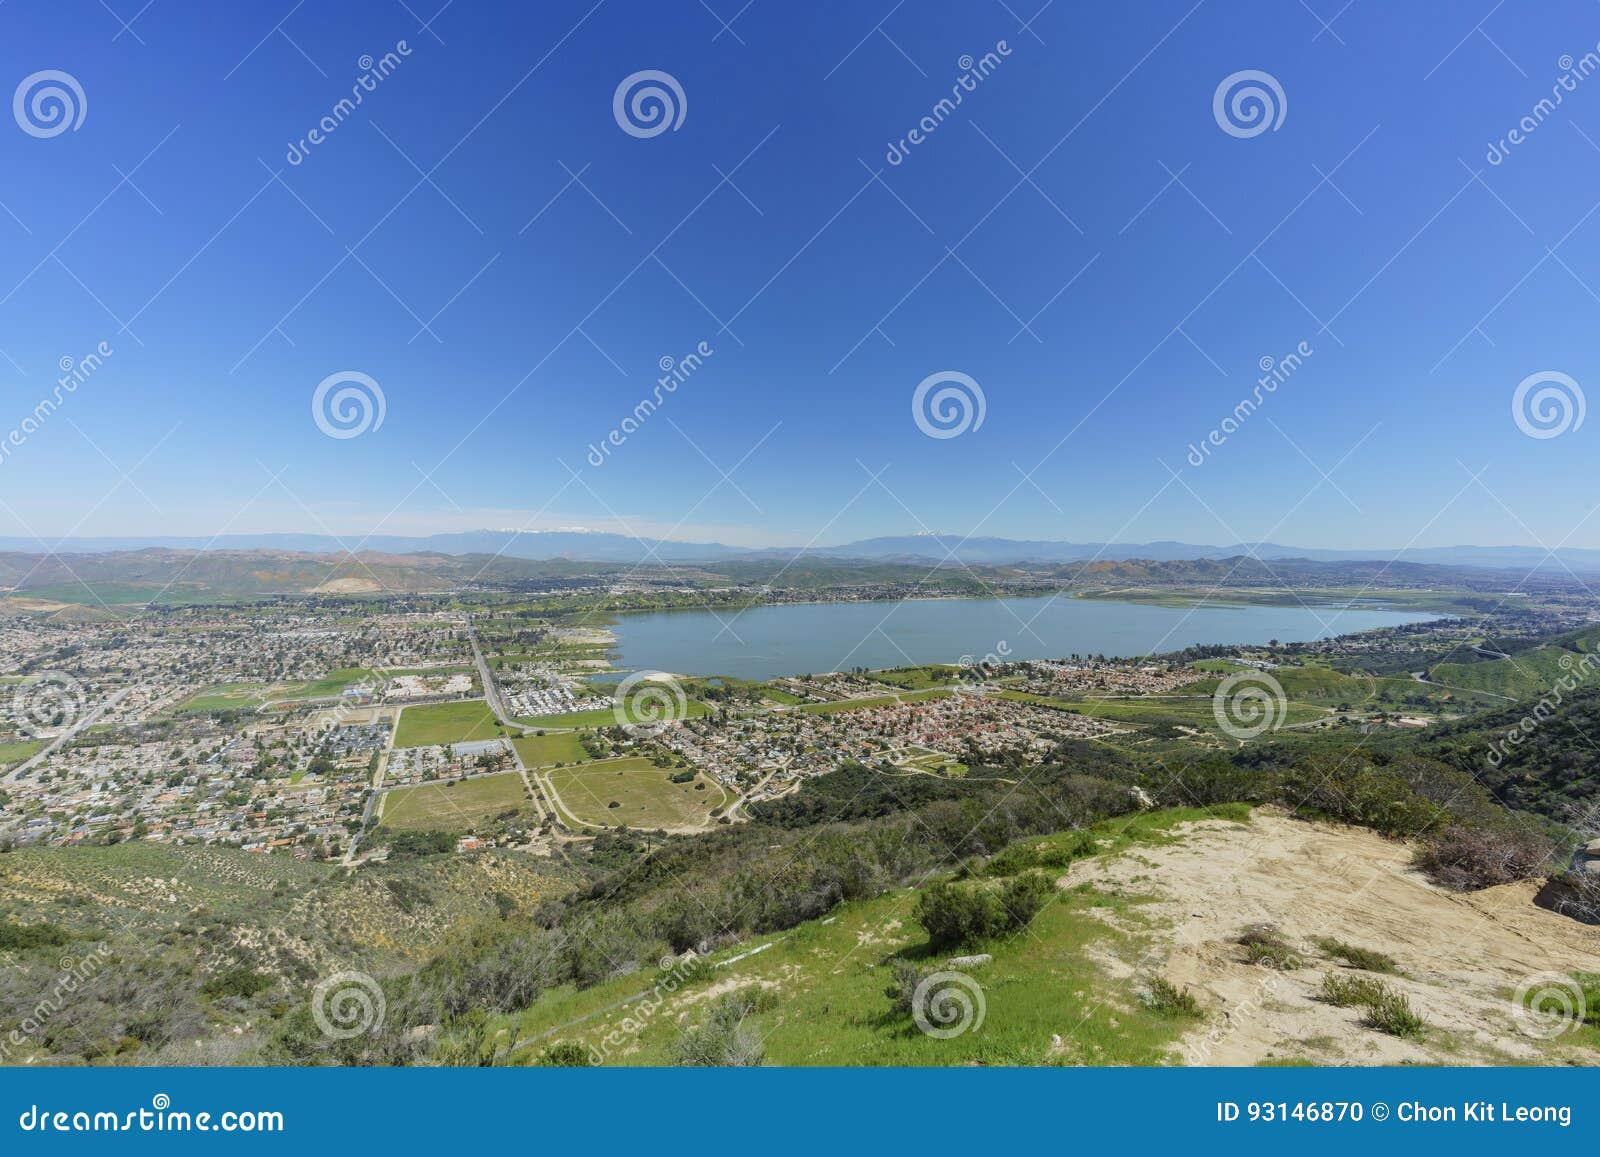 Vista aérea do lago Elsinore